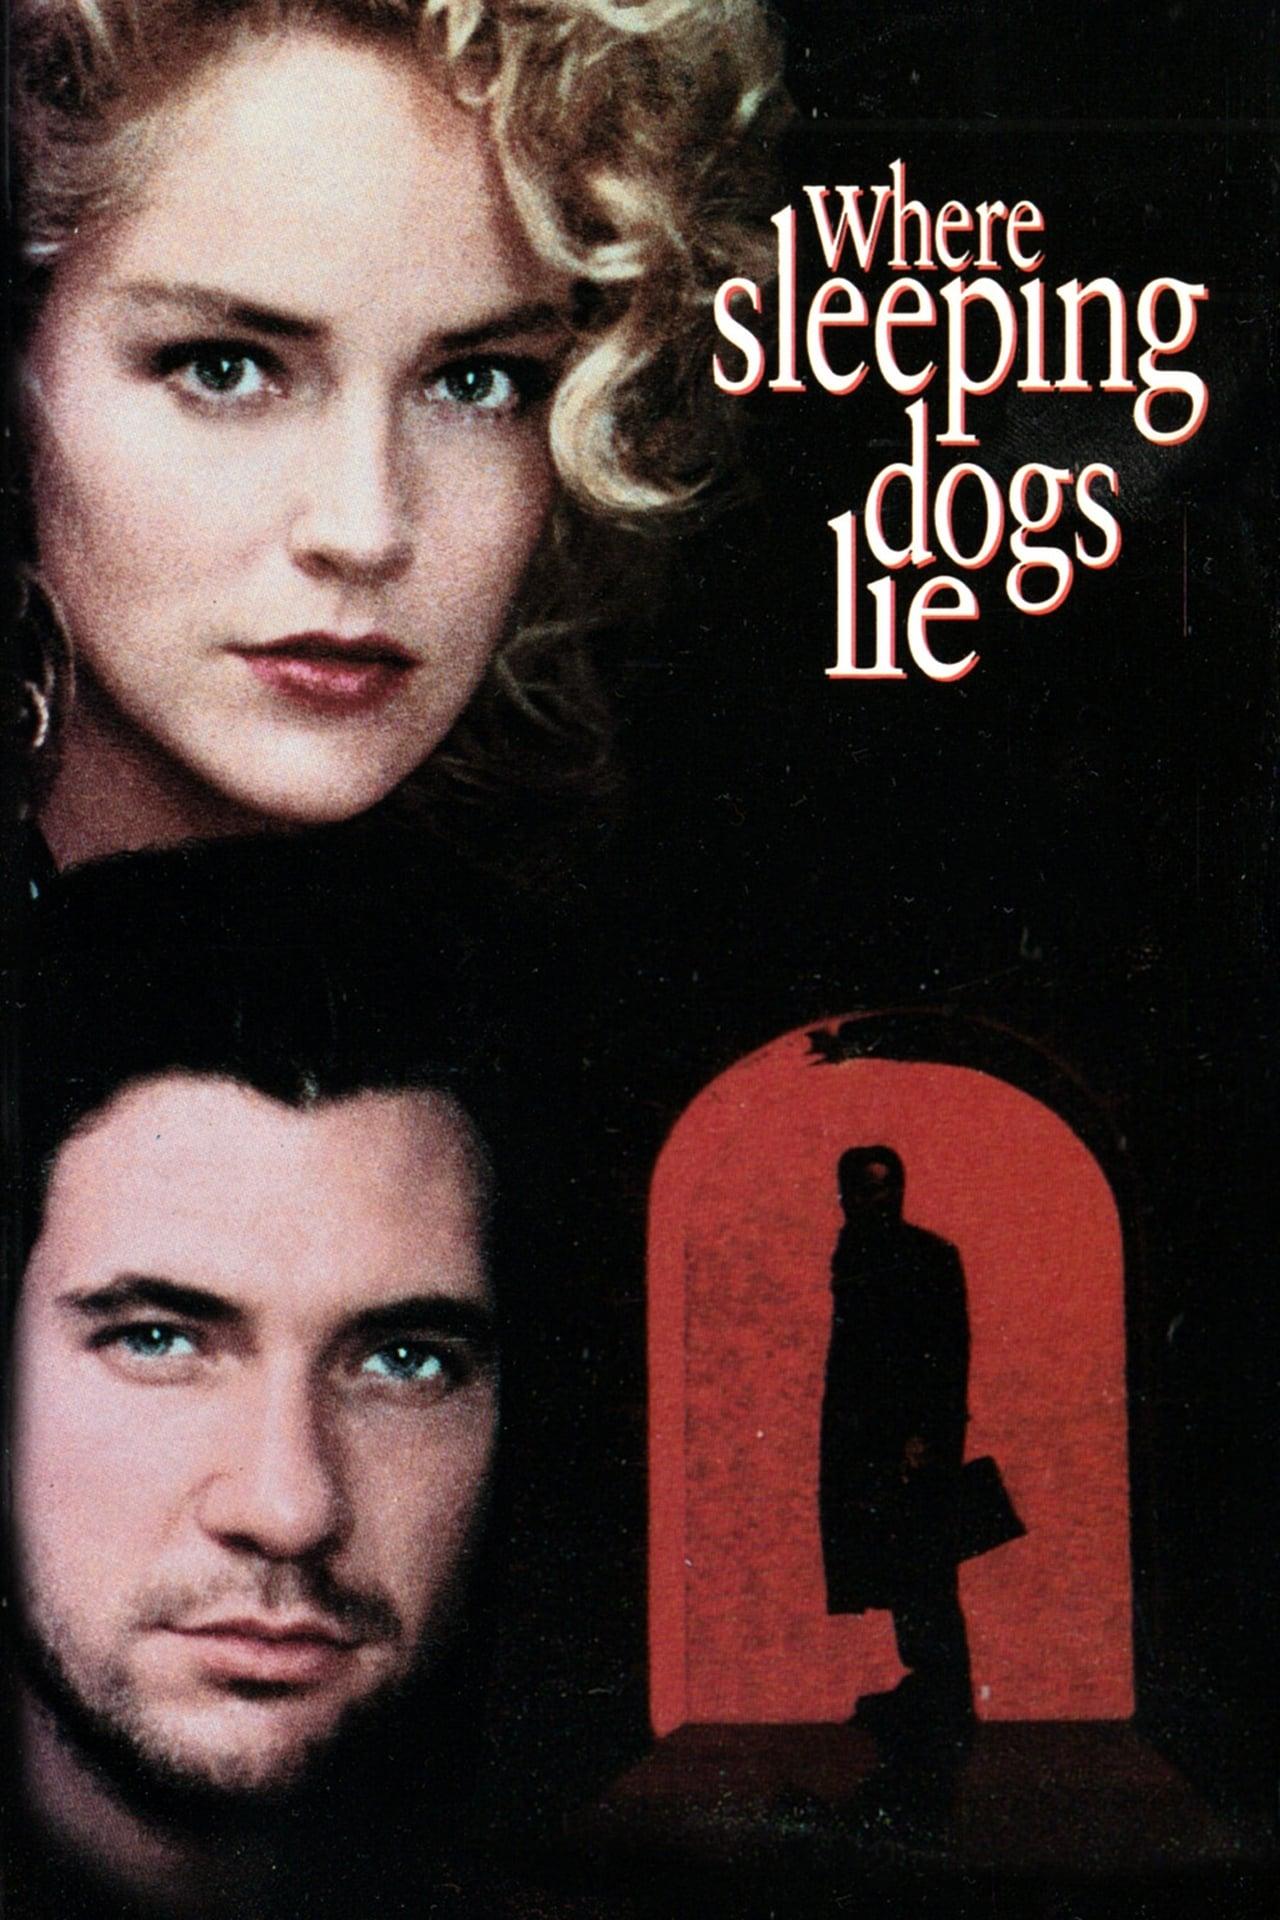 Watch sleeping dogs lie 2005 online dating